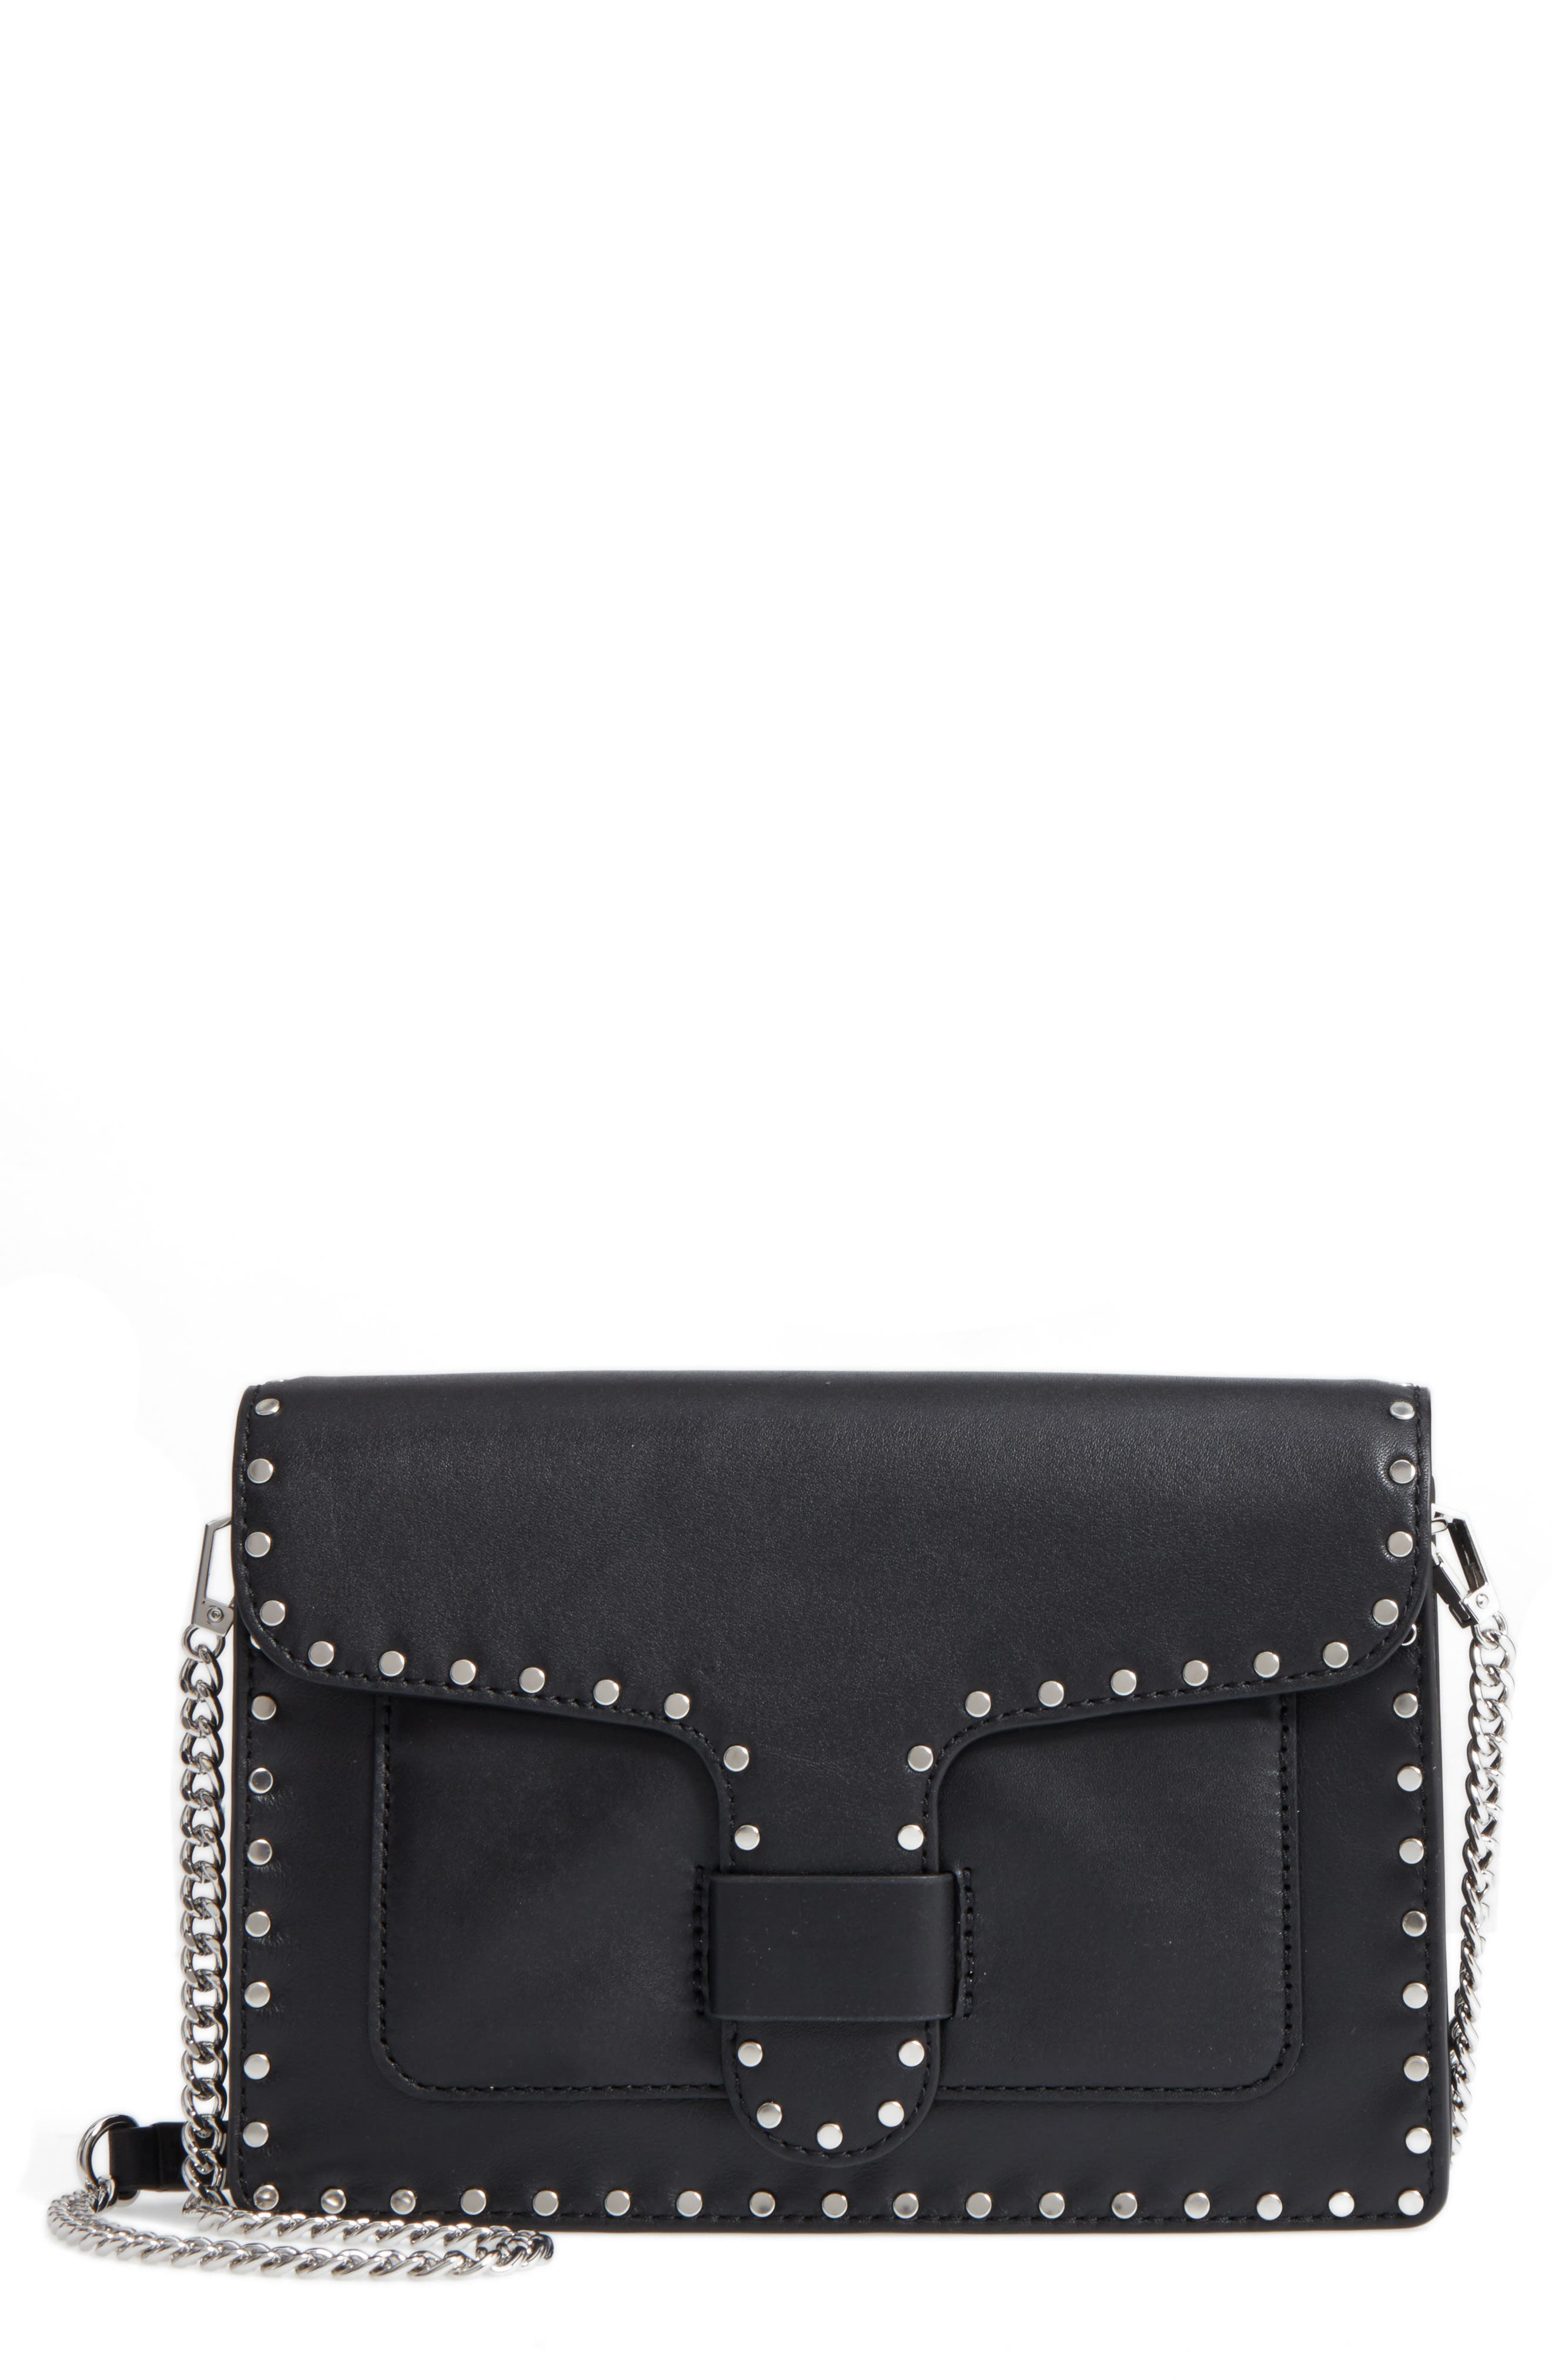 Medium Midnighter Leather Crossbody Bag,                         Main,                         color, 001